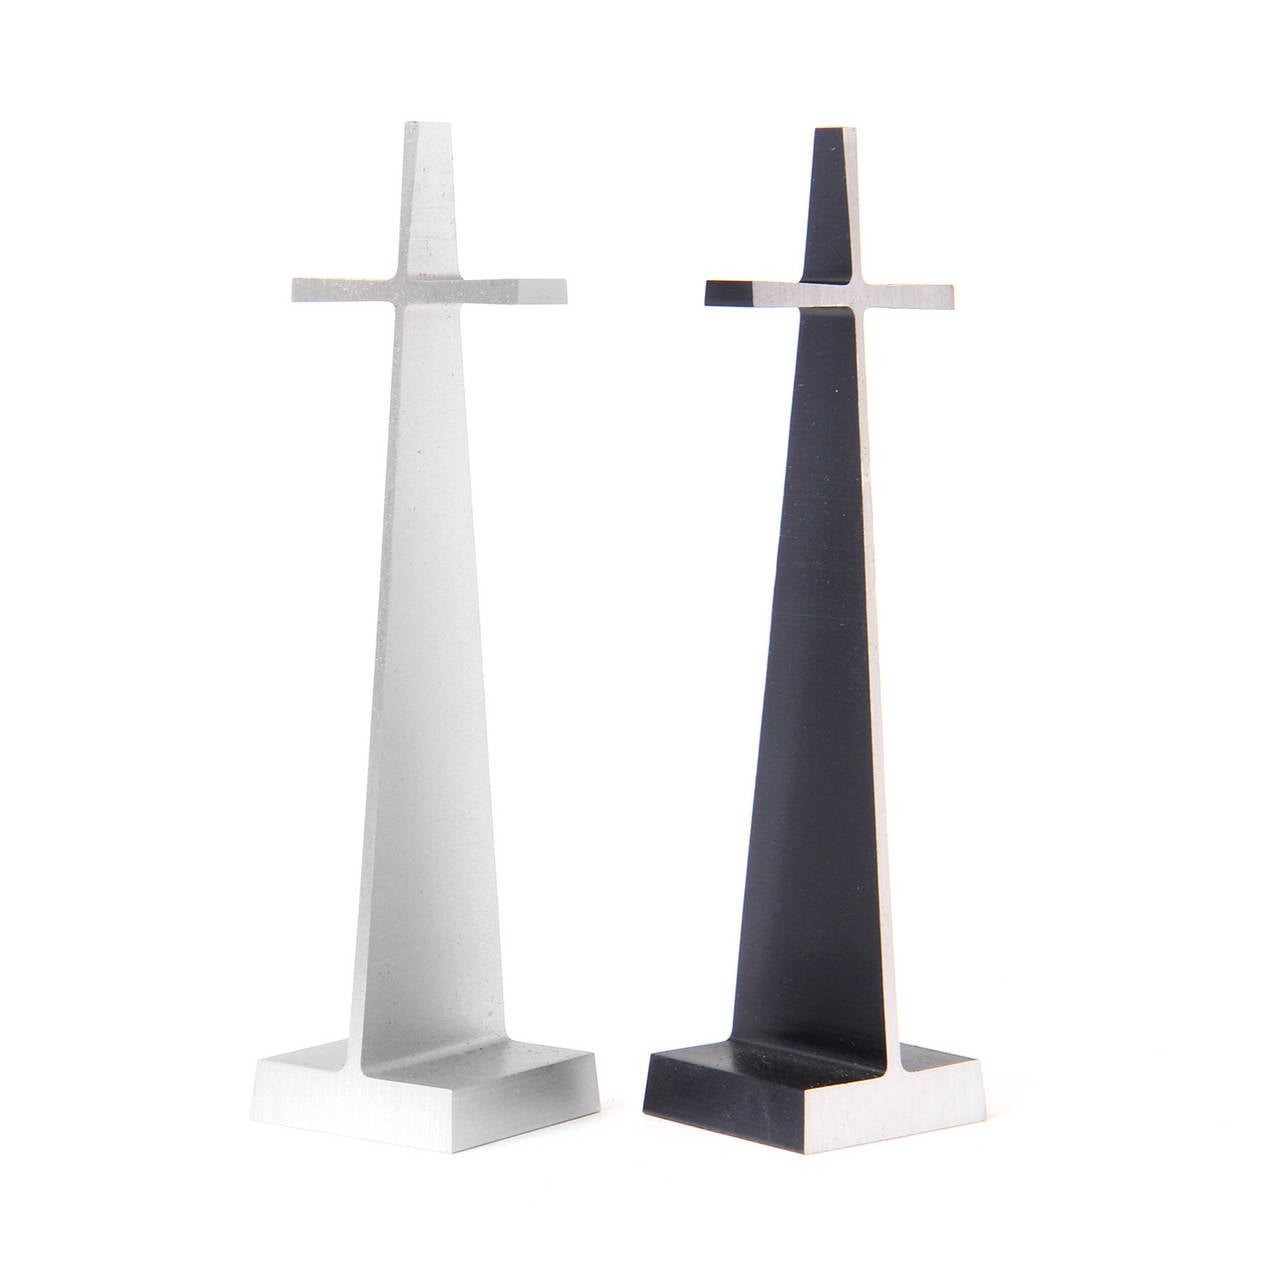 Modernist Chess Set by Austin Cox 1